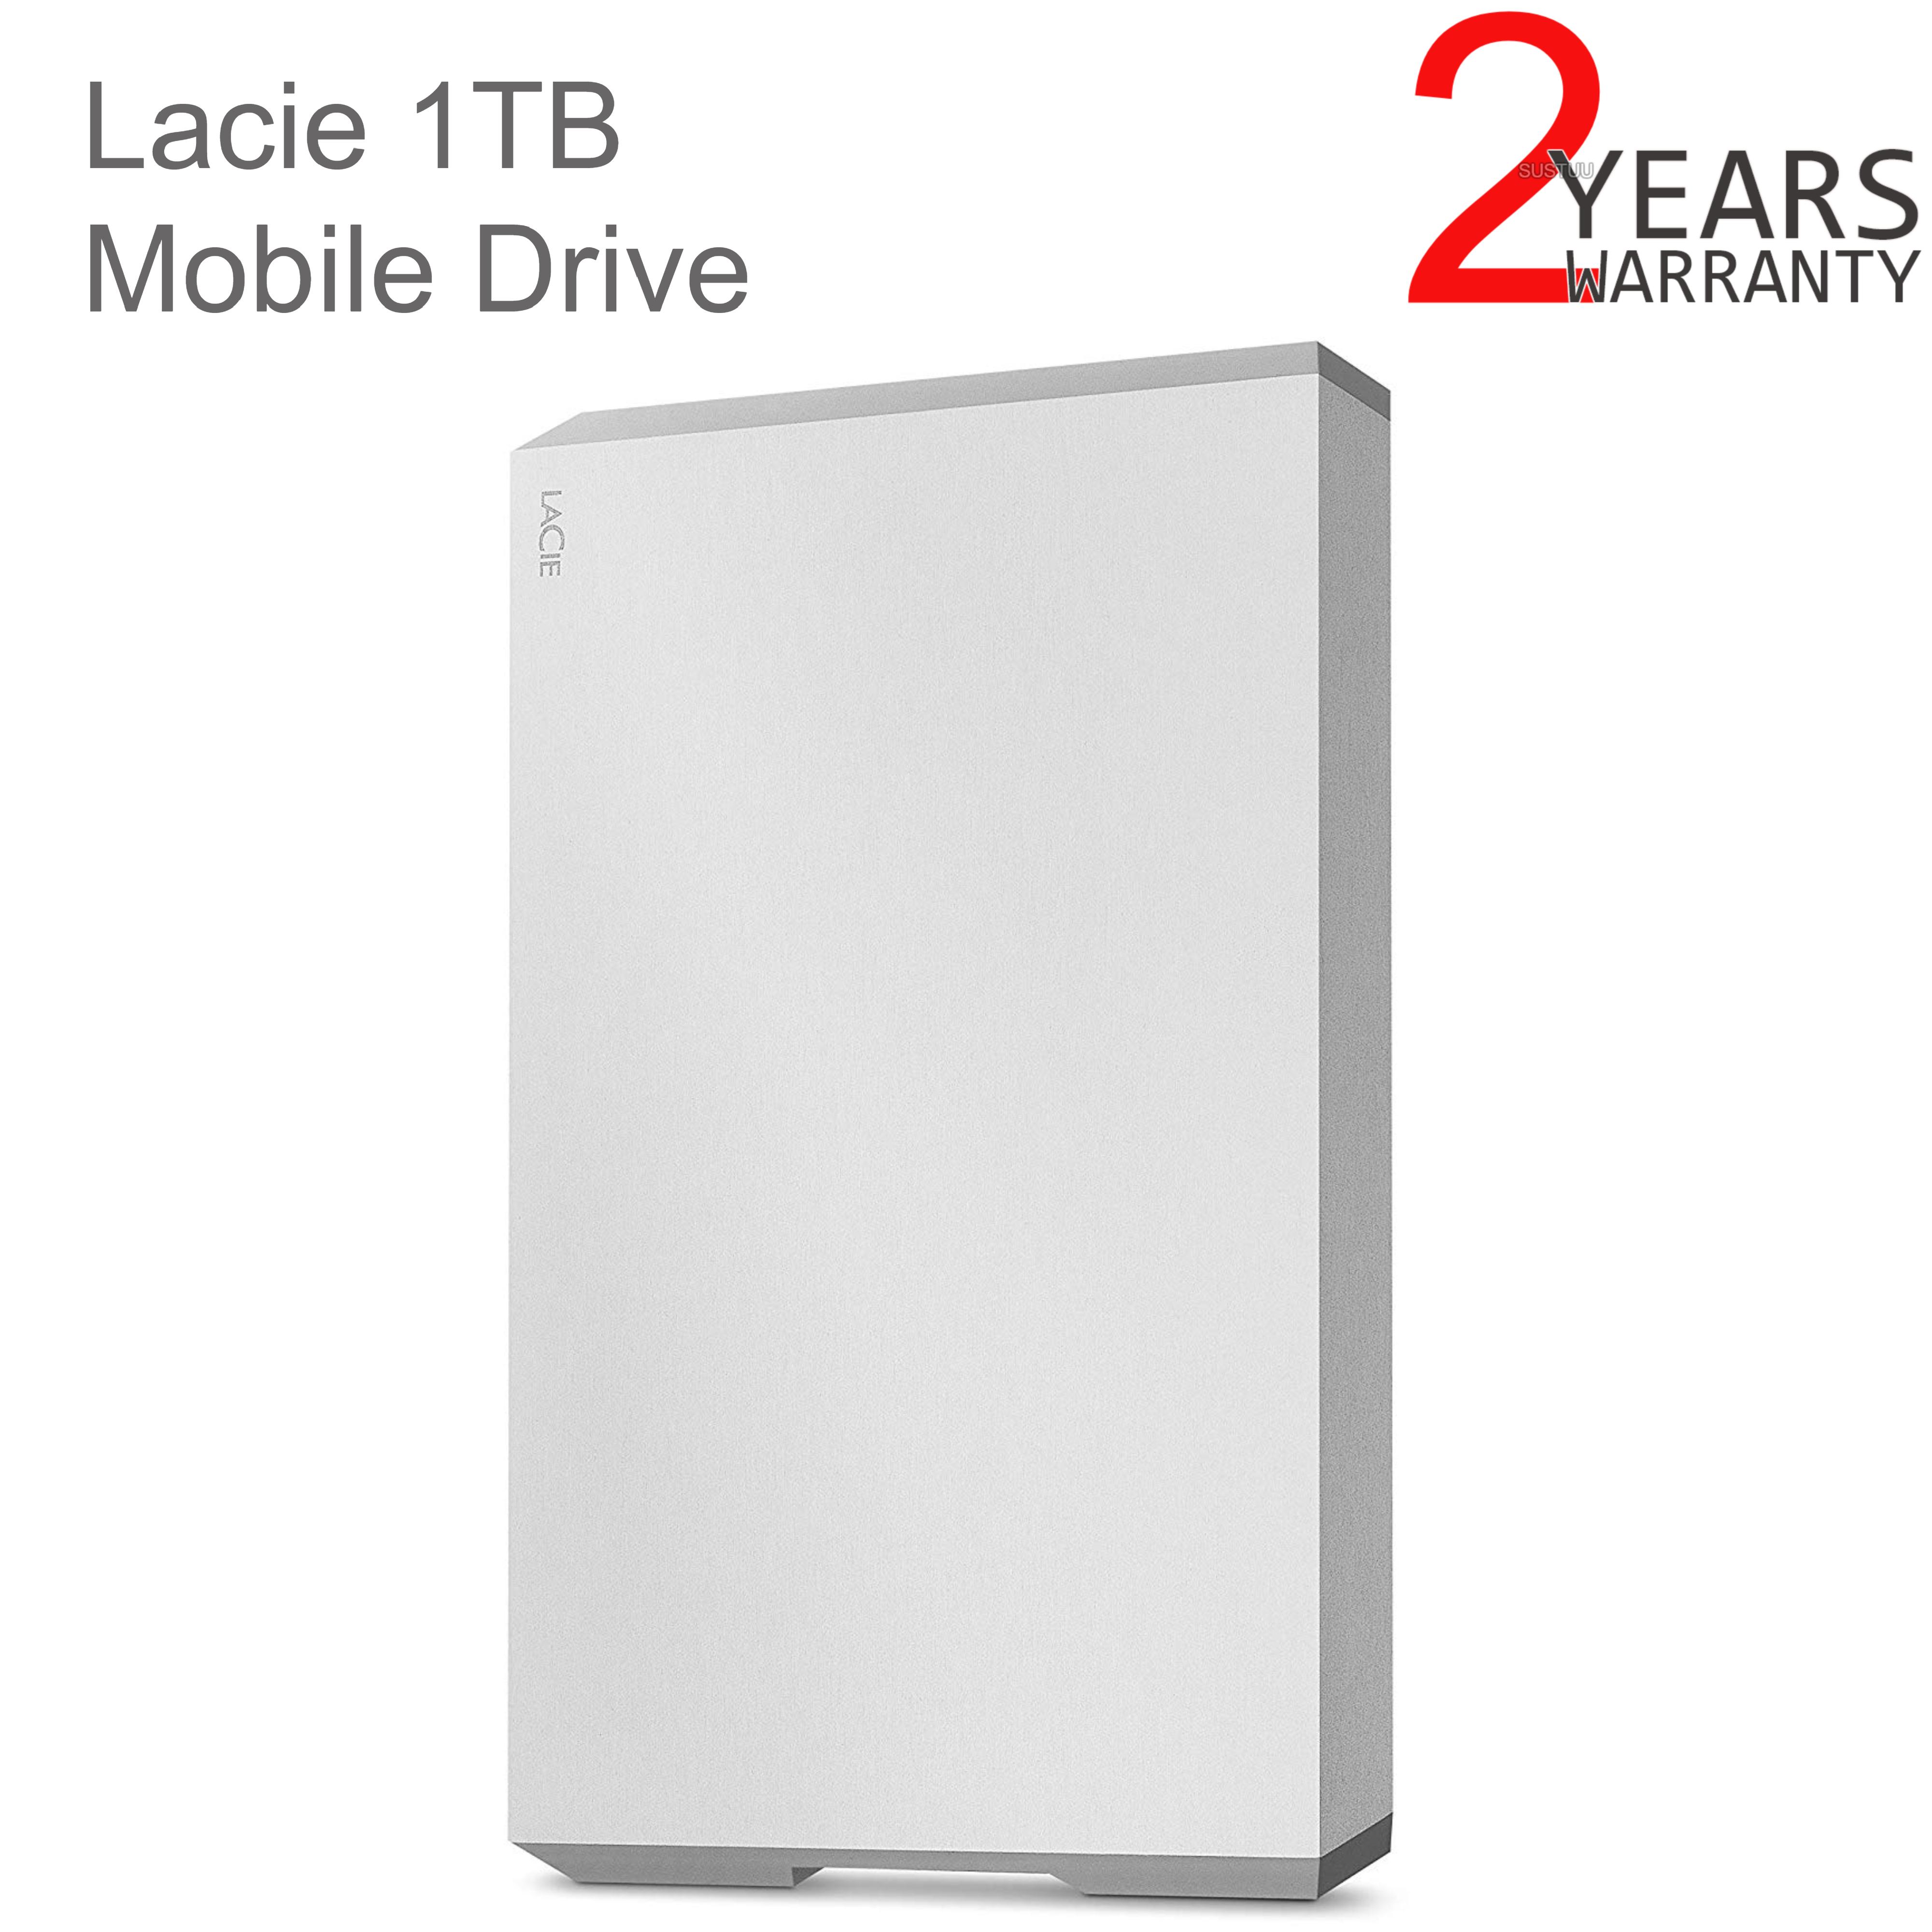 Lacie 1TB Mobile Drive | USB 3.0 Type-C Portable External Hard Drive | For PC & Mac | Storage